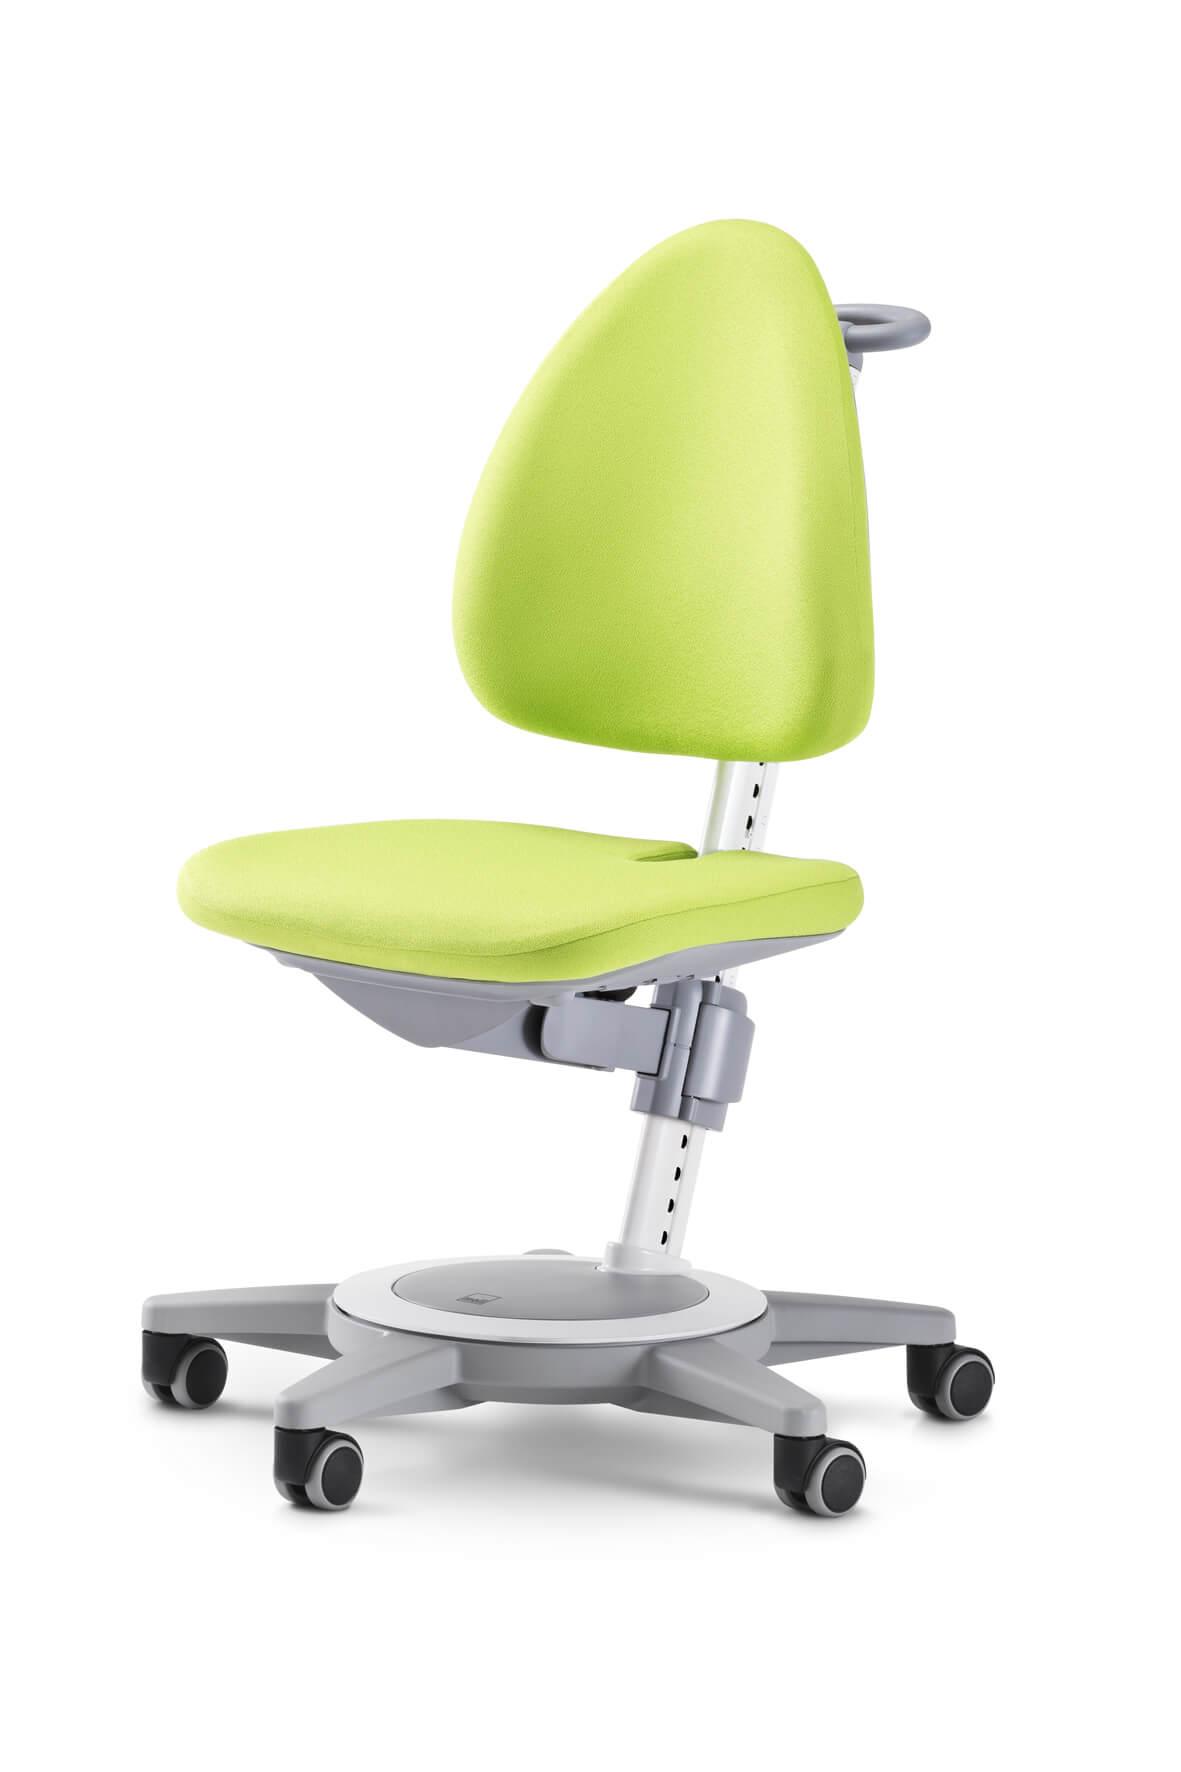 Регулируемый детский стул - moll  MAXIMO 15